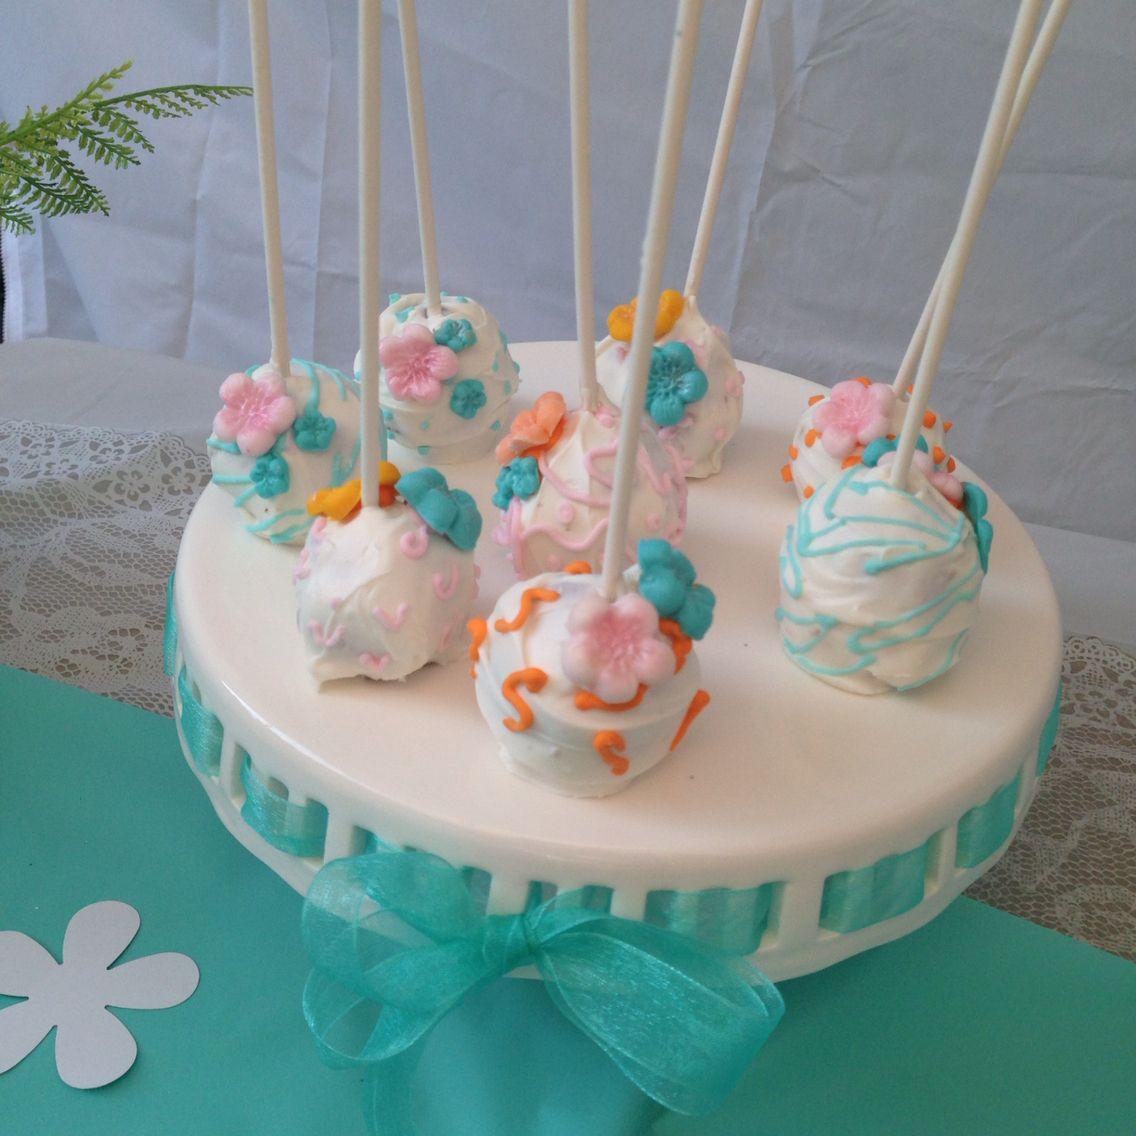 Cake pop flowers theme